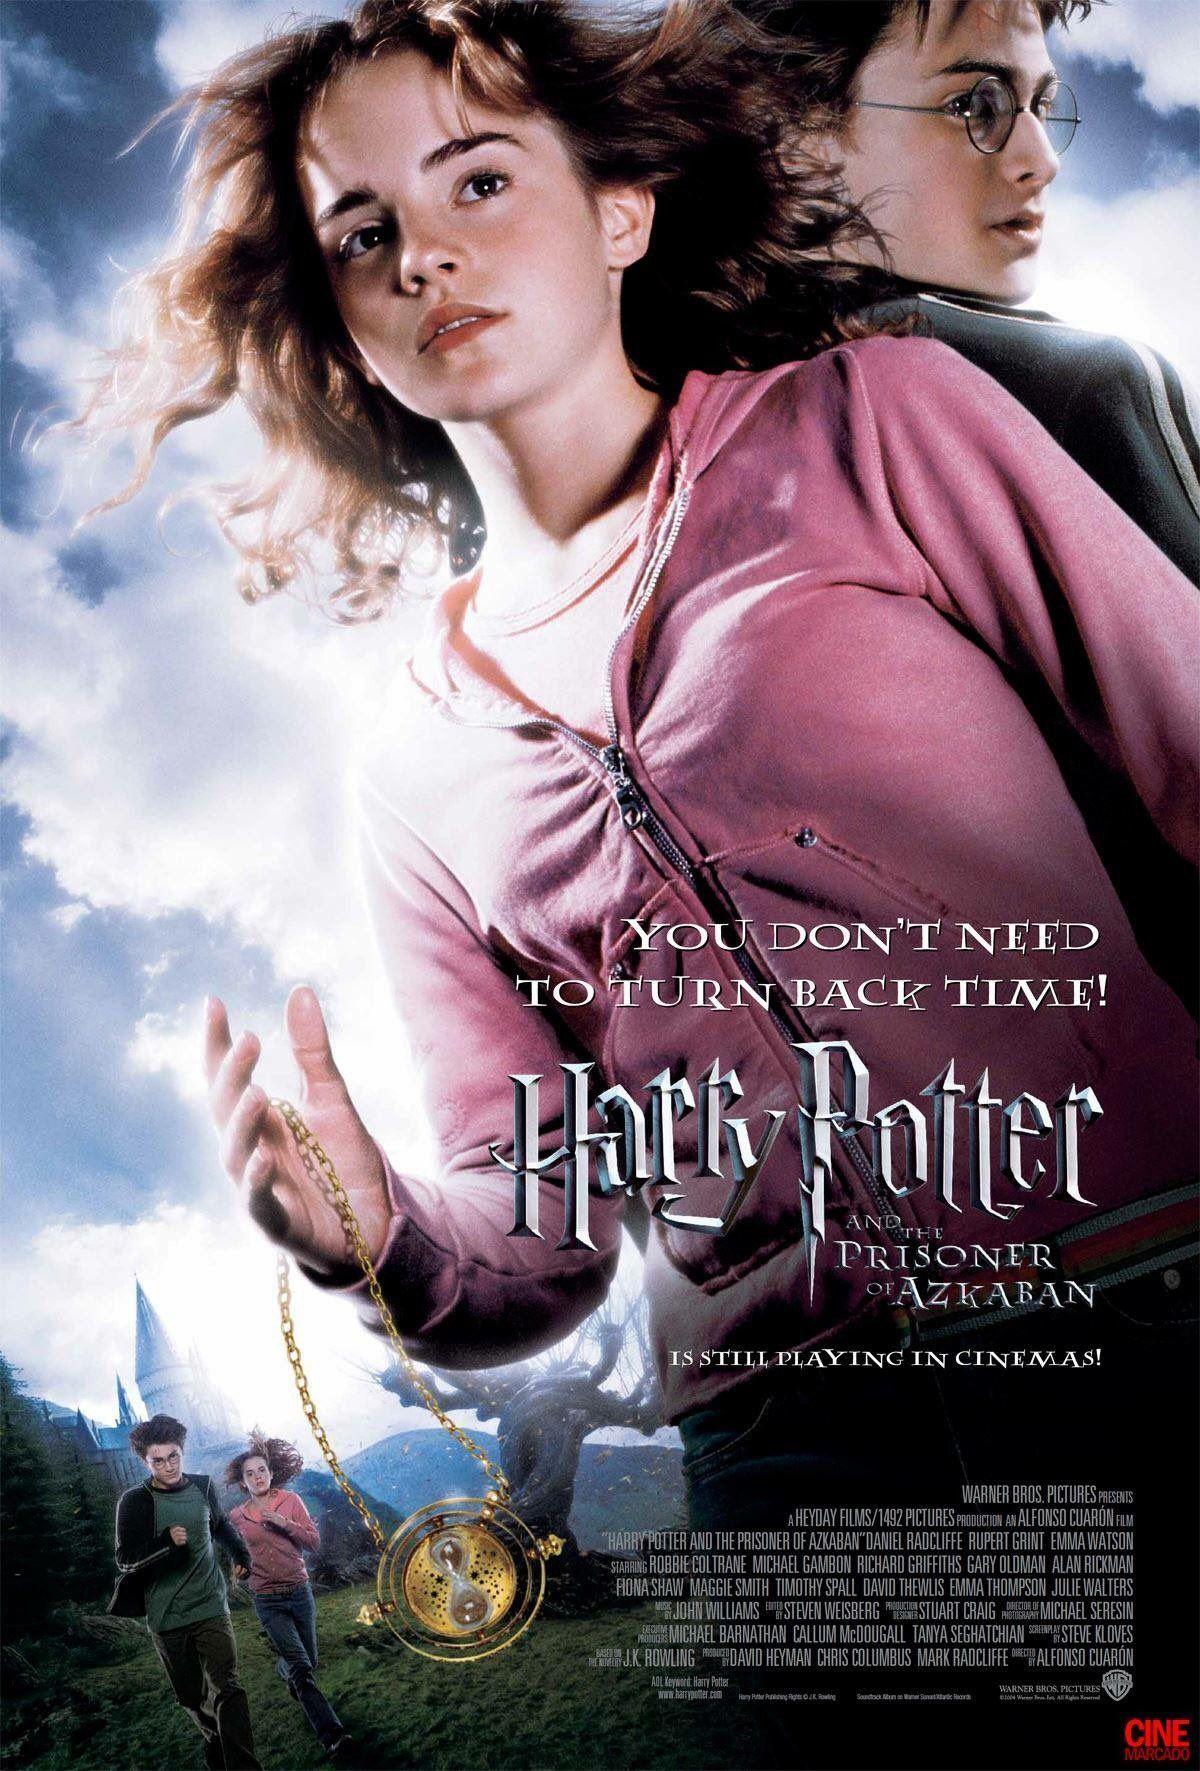 Ace K On Twitter Harry Potter Pictures Prisoner Of Azkaban Harry Potter Movie Posters